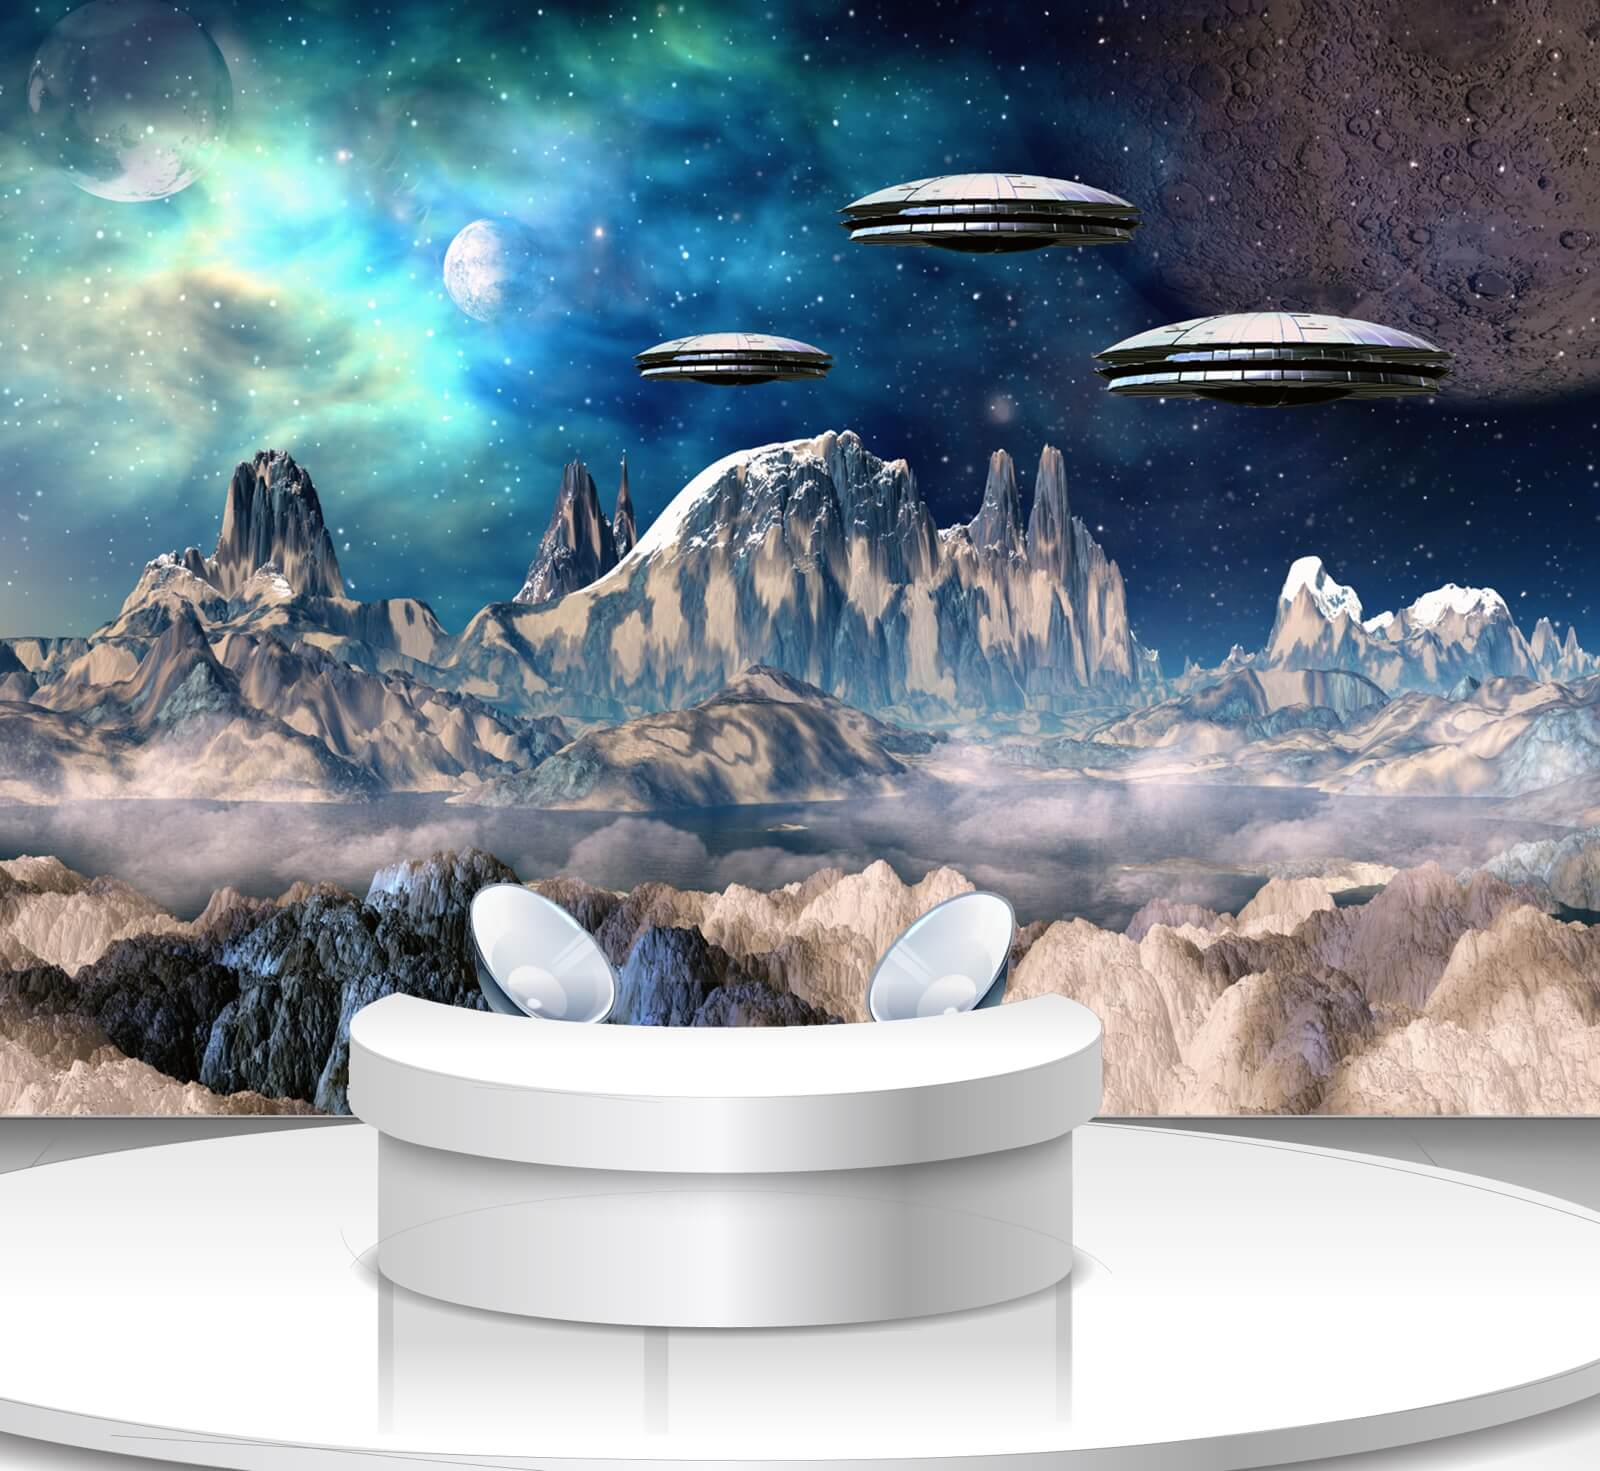 Vlies Tapete Poster Fototapete Science-Fiction Weltraum Ufo